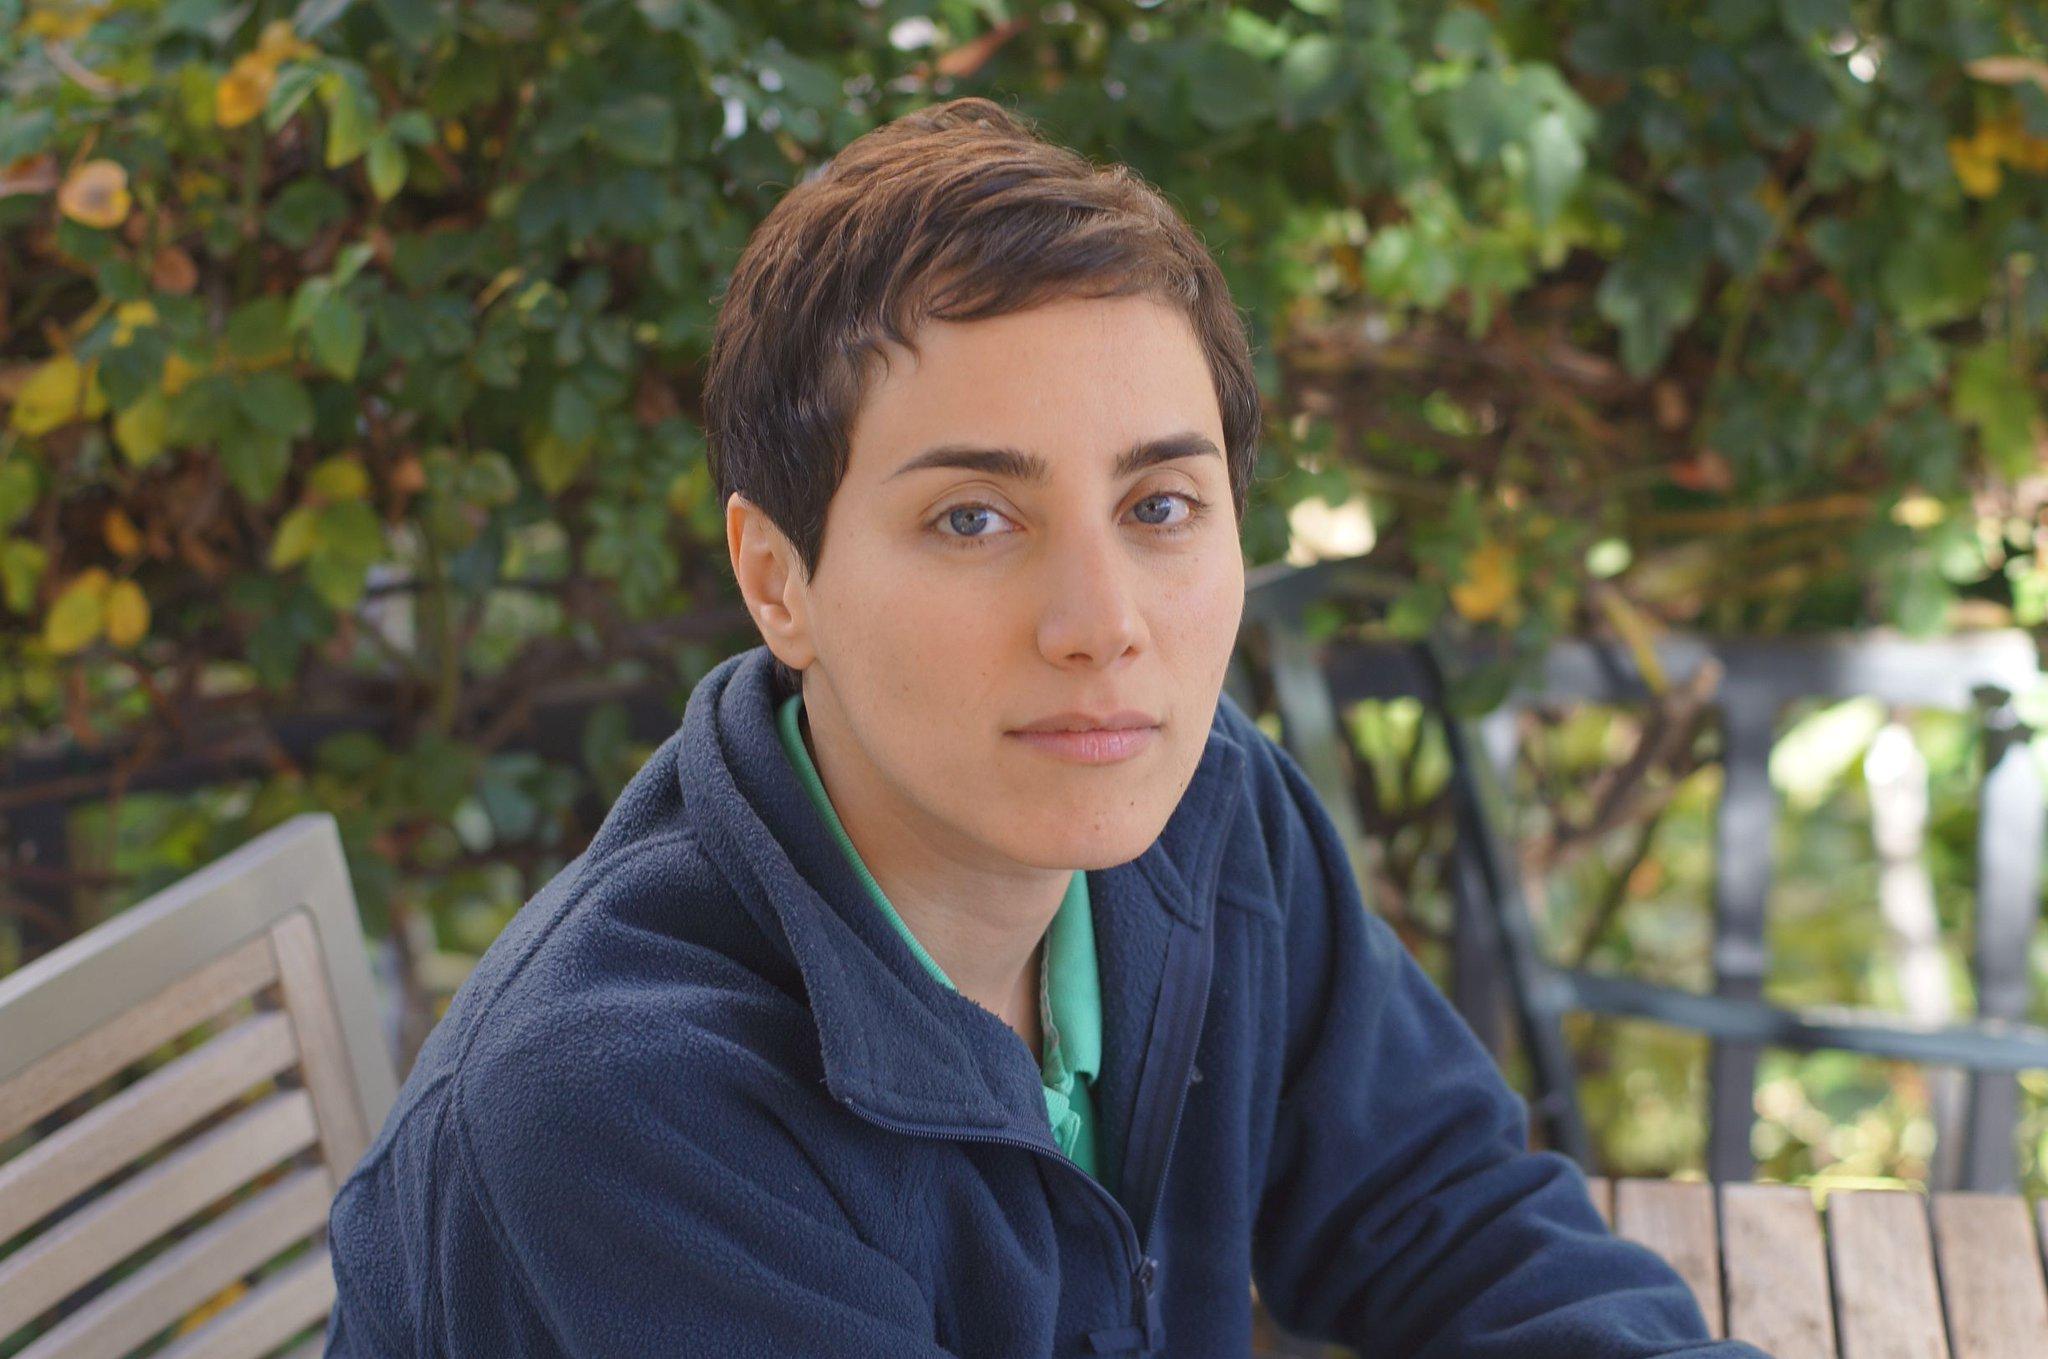 Thumbnail for Maryam Mirzakhani